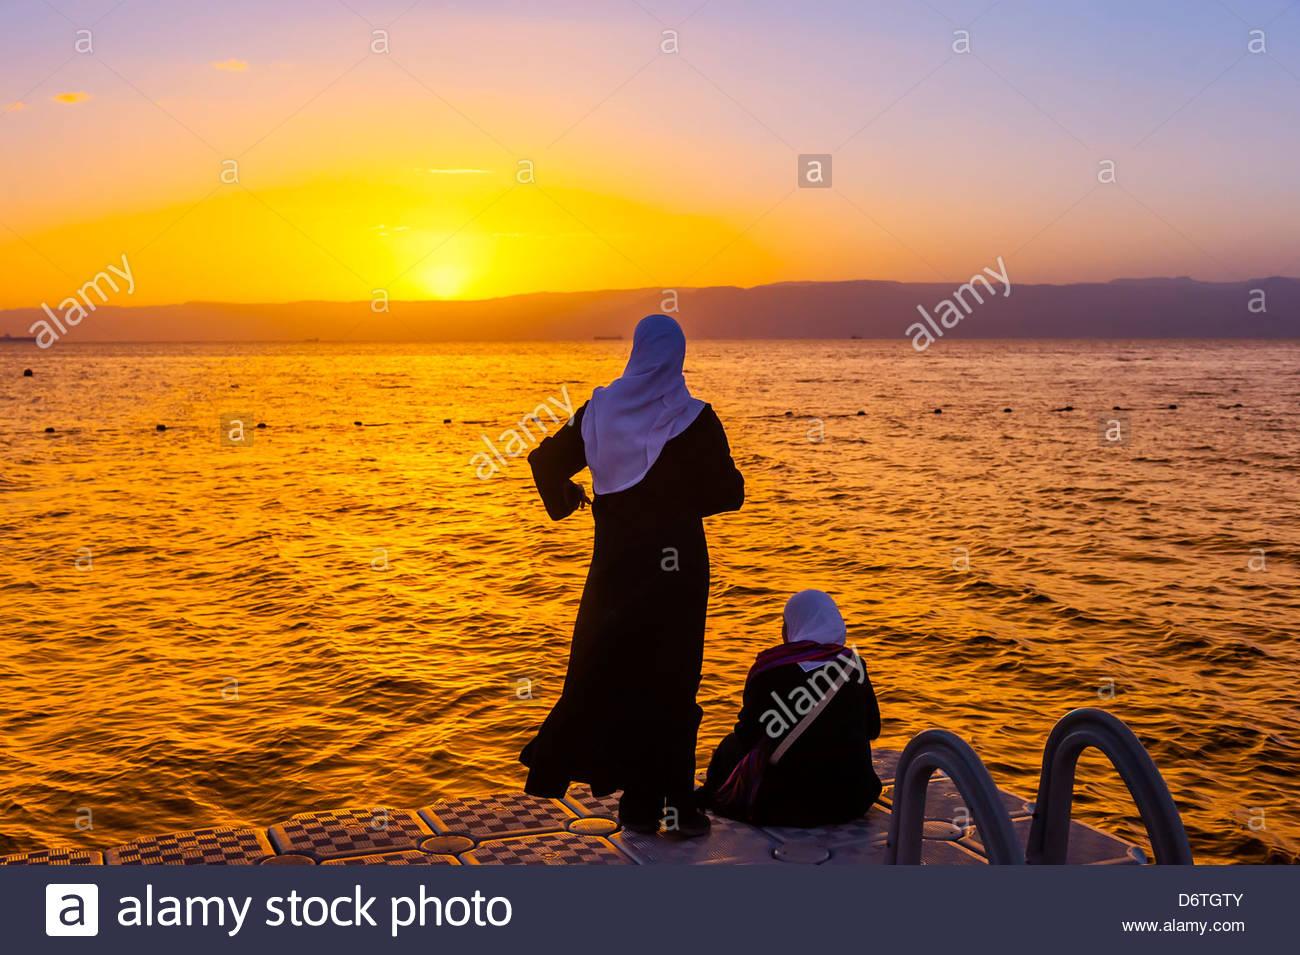 Jordanian women watching the sunset across the Gulf of Aqaba, Red Sea, Jordan from a dock at the Radisson Blu Tala - Stock Image